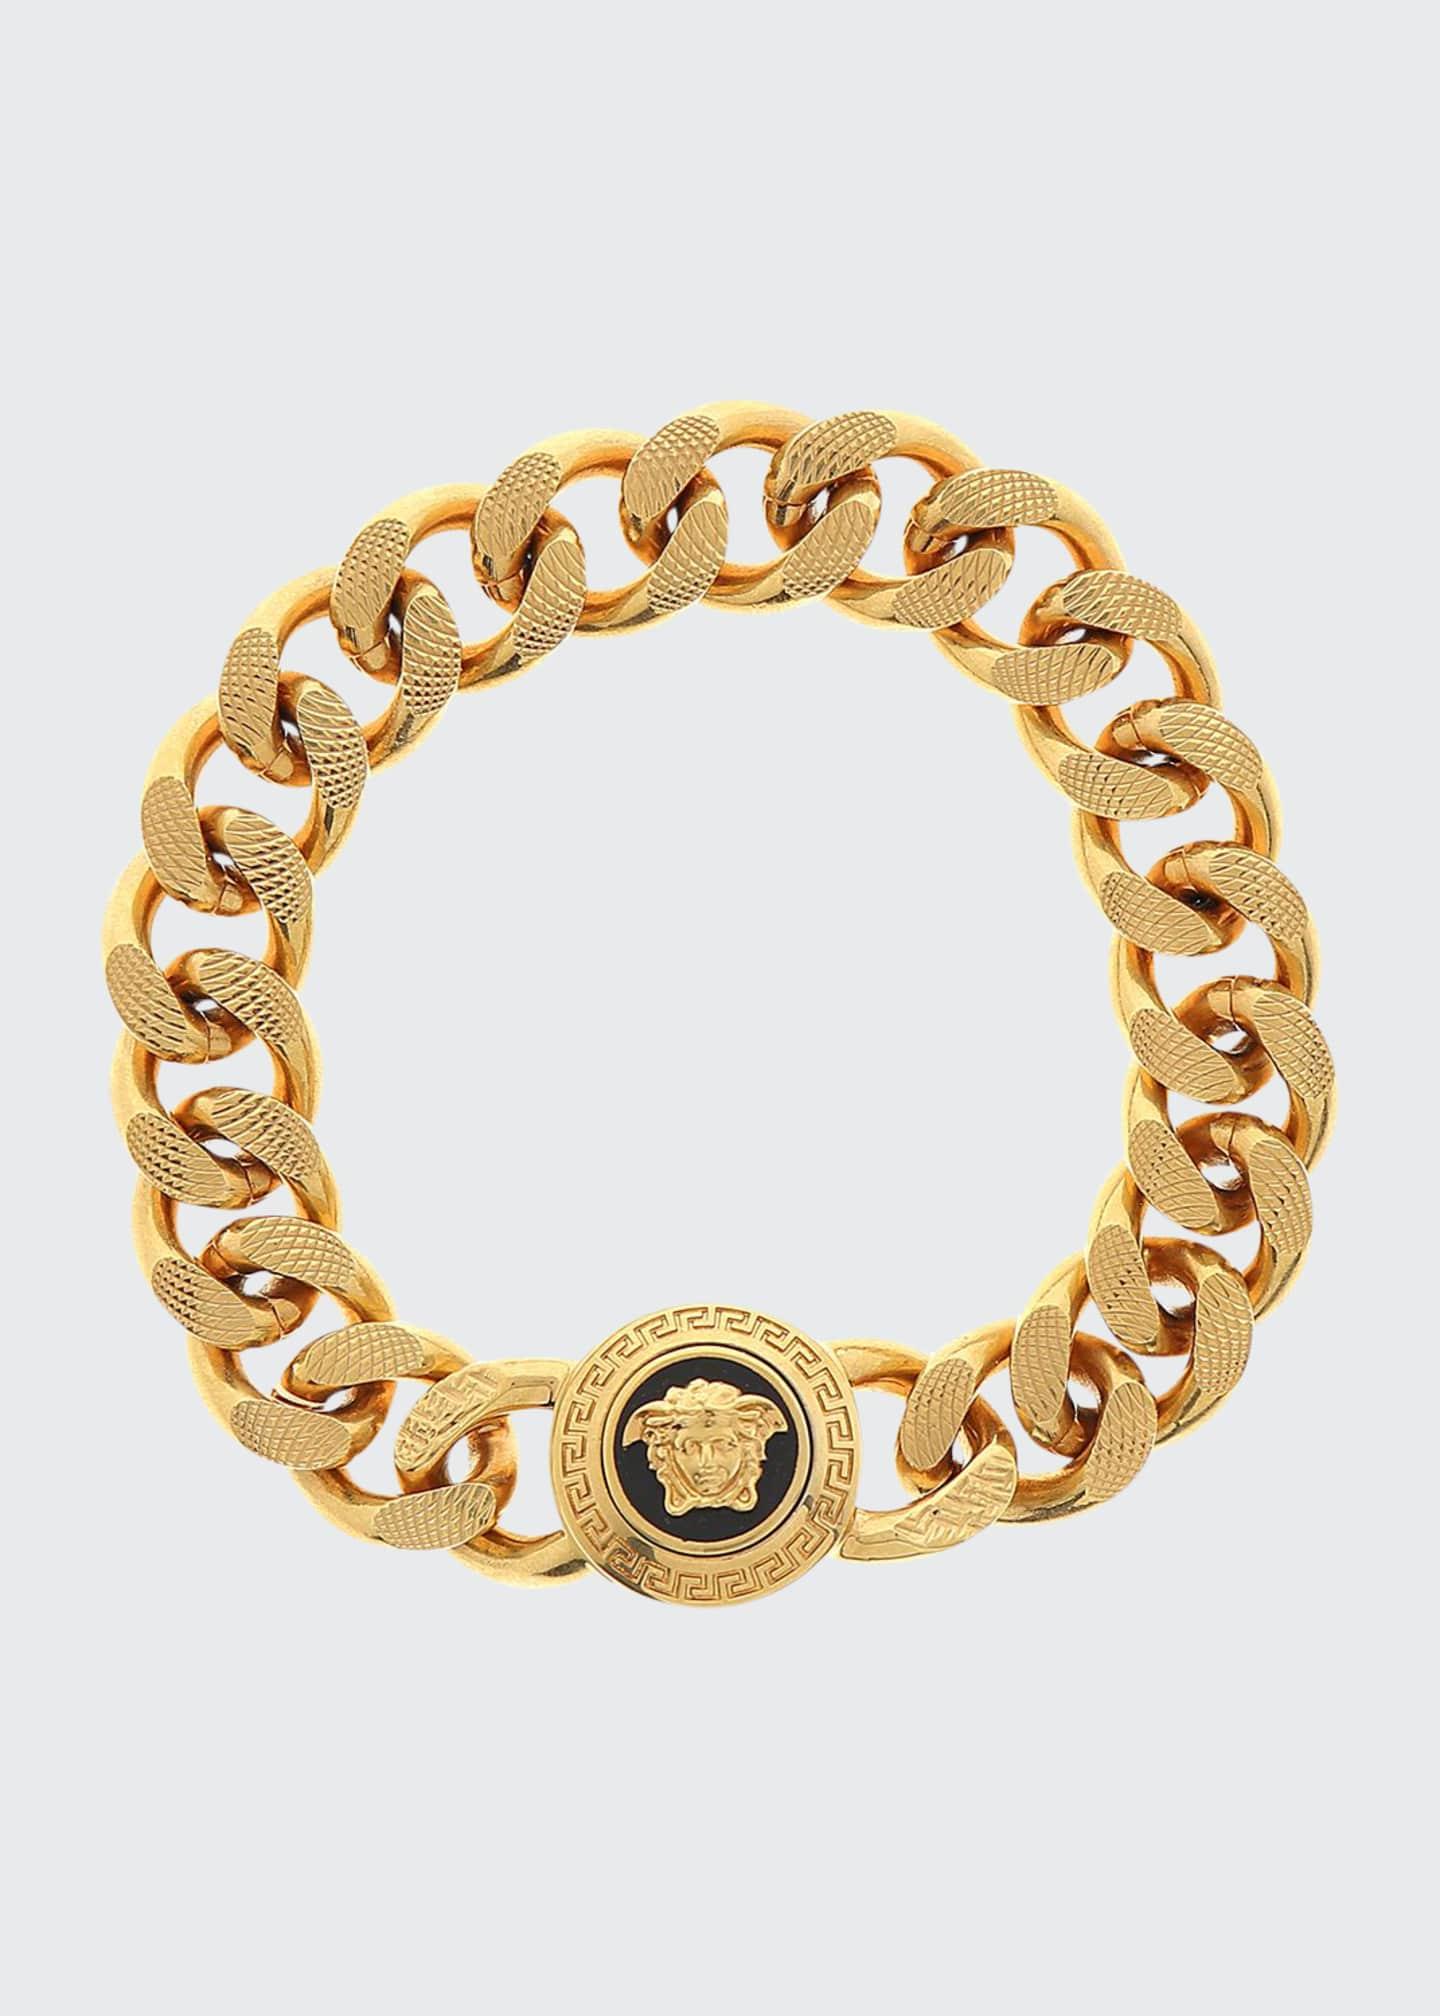 Versace Men's Tribute Medusa Head Textured Link Bracelet